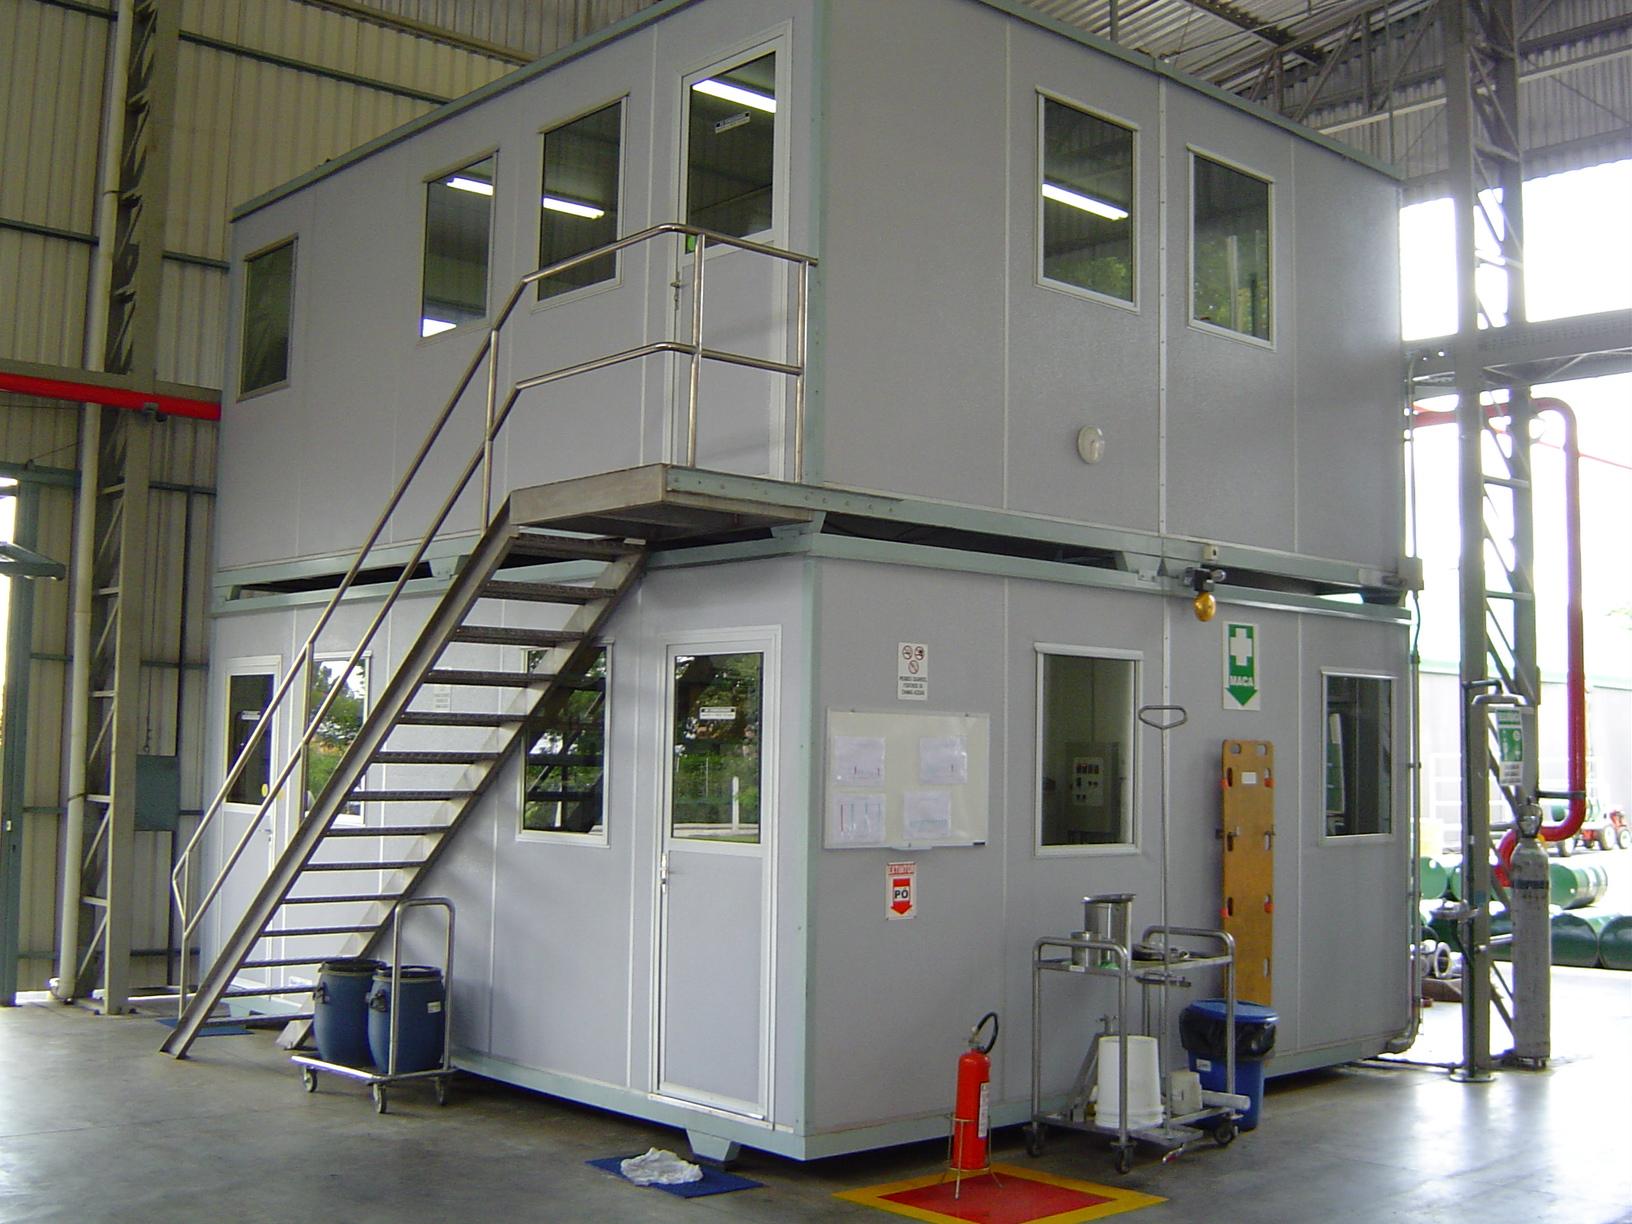 container sobreposto dois andares